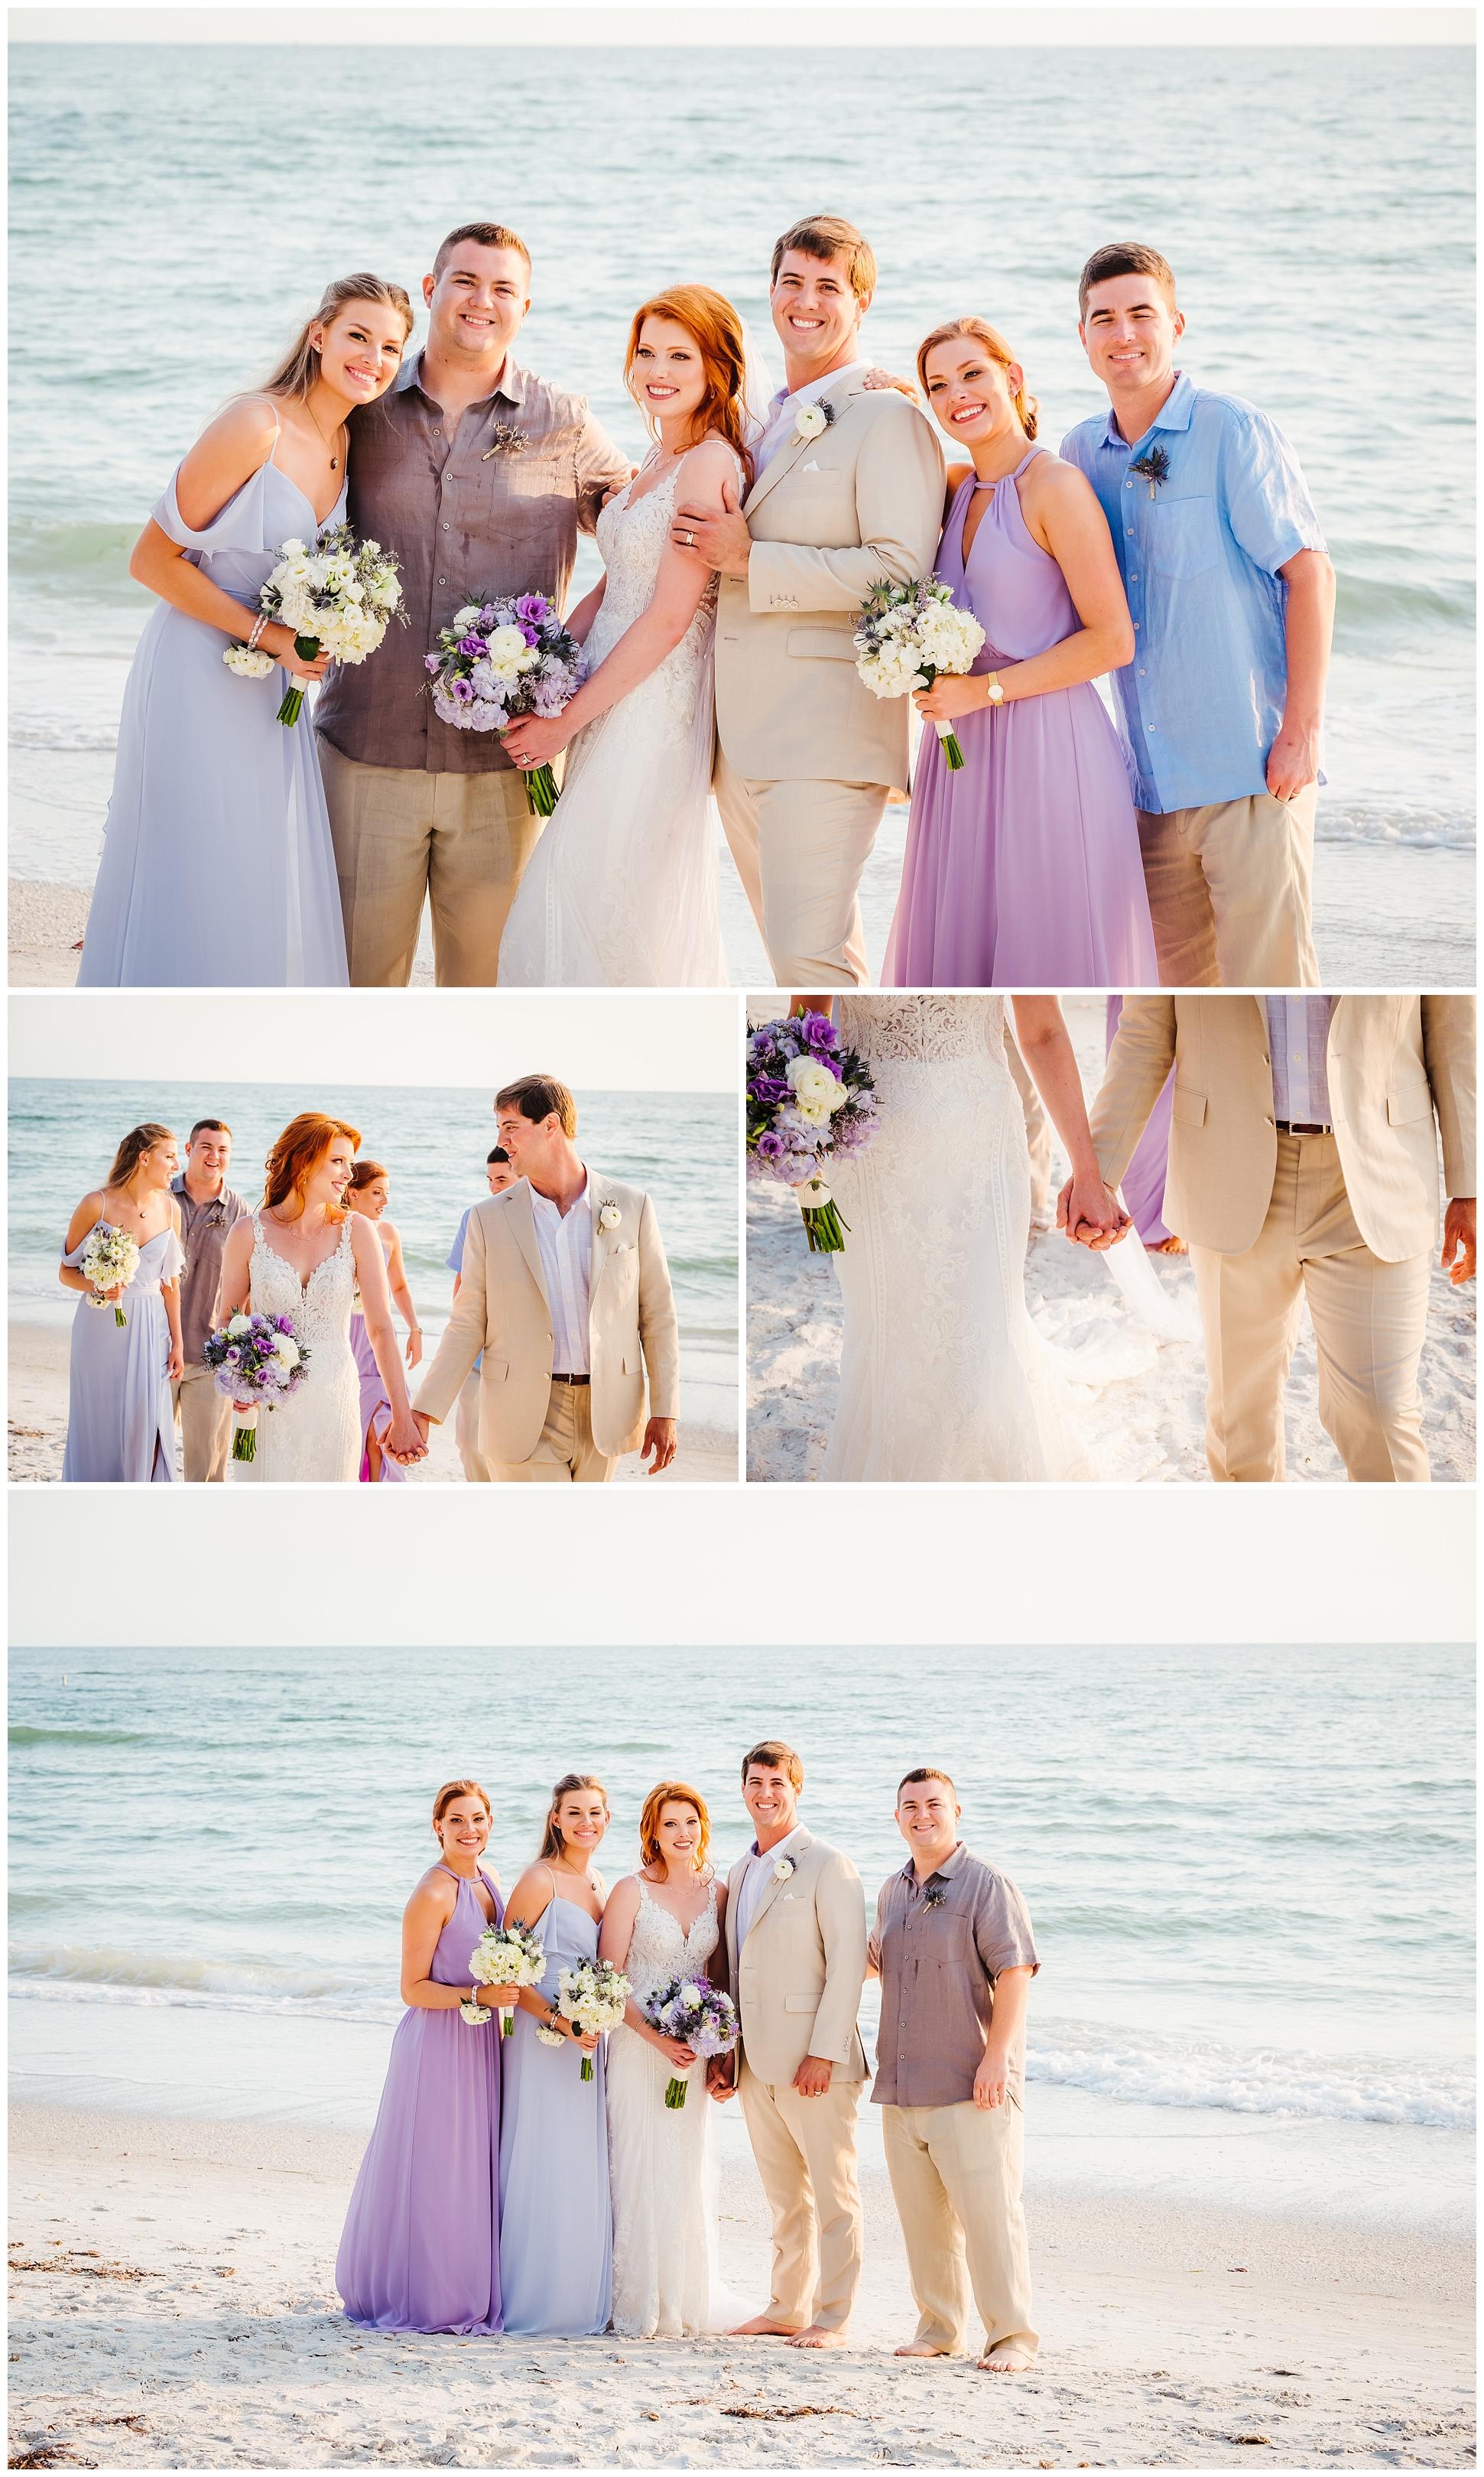 tampa-st-pete-wedding-photographer-indian-rocks-beach-mermaid-train-redhead_0146.jpg